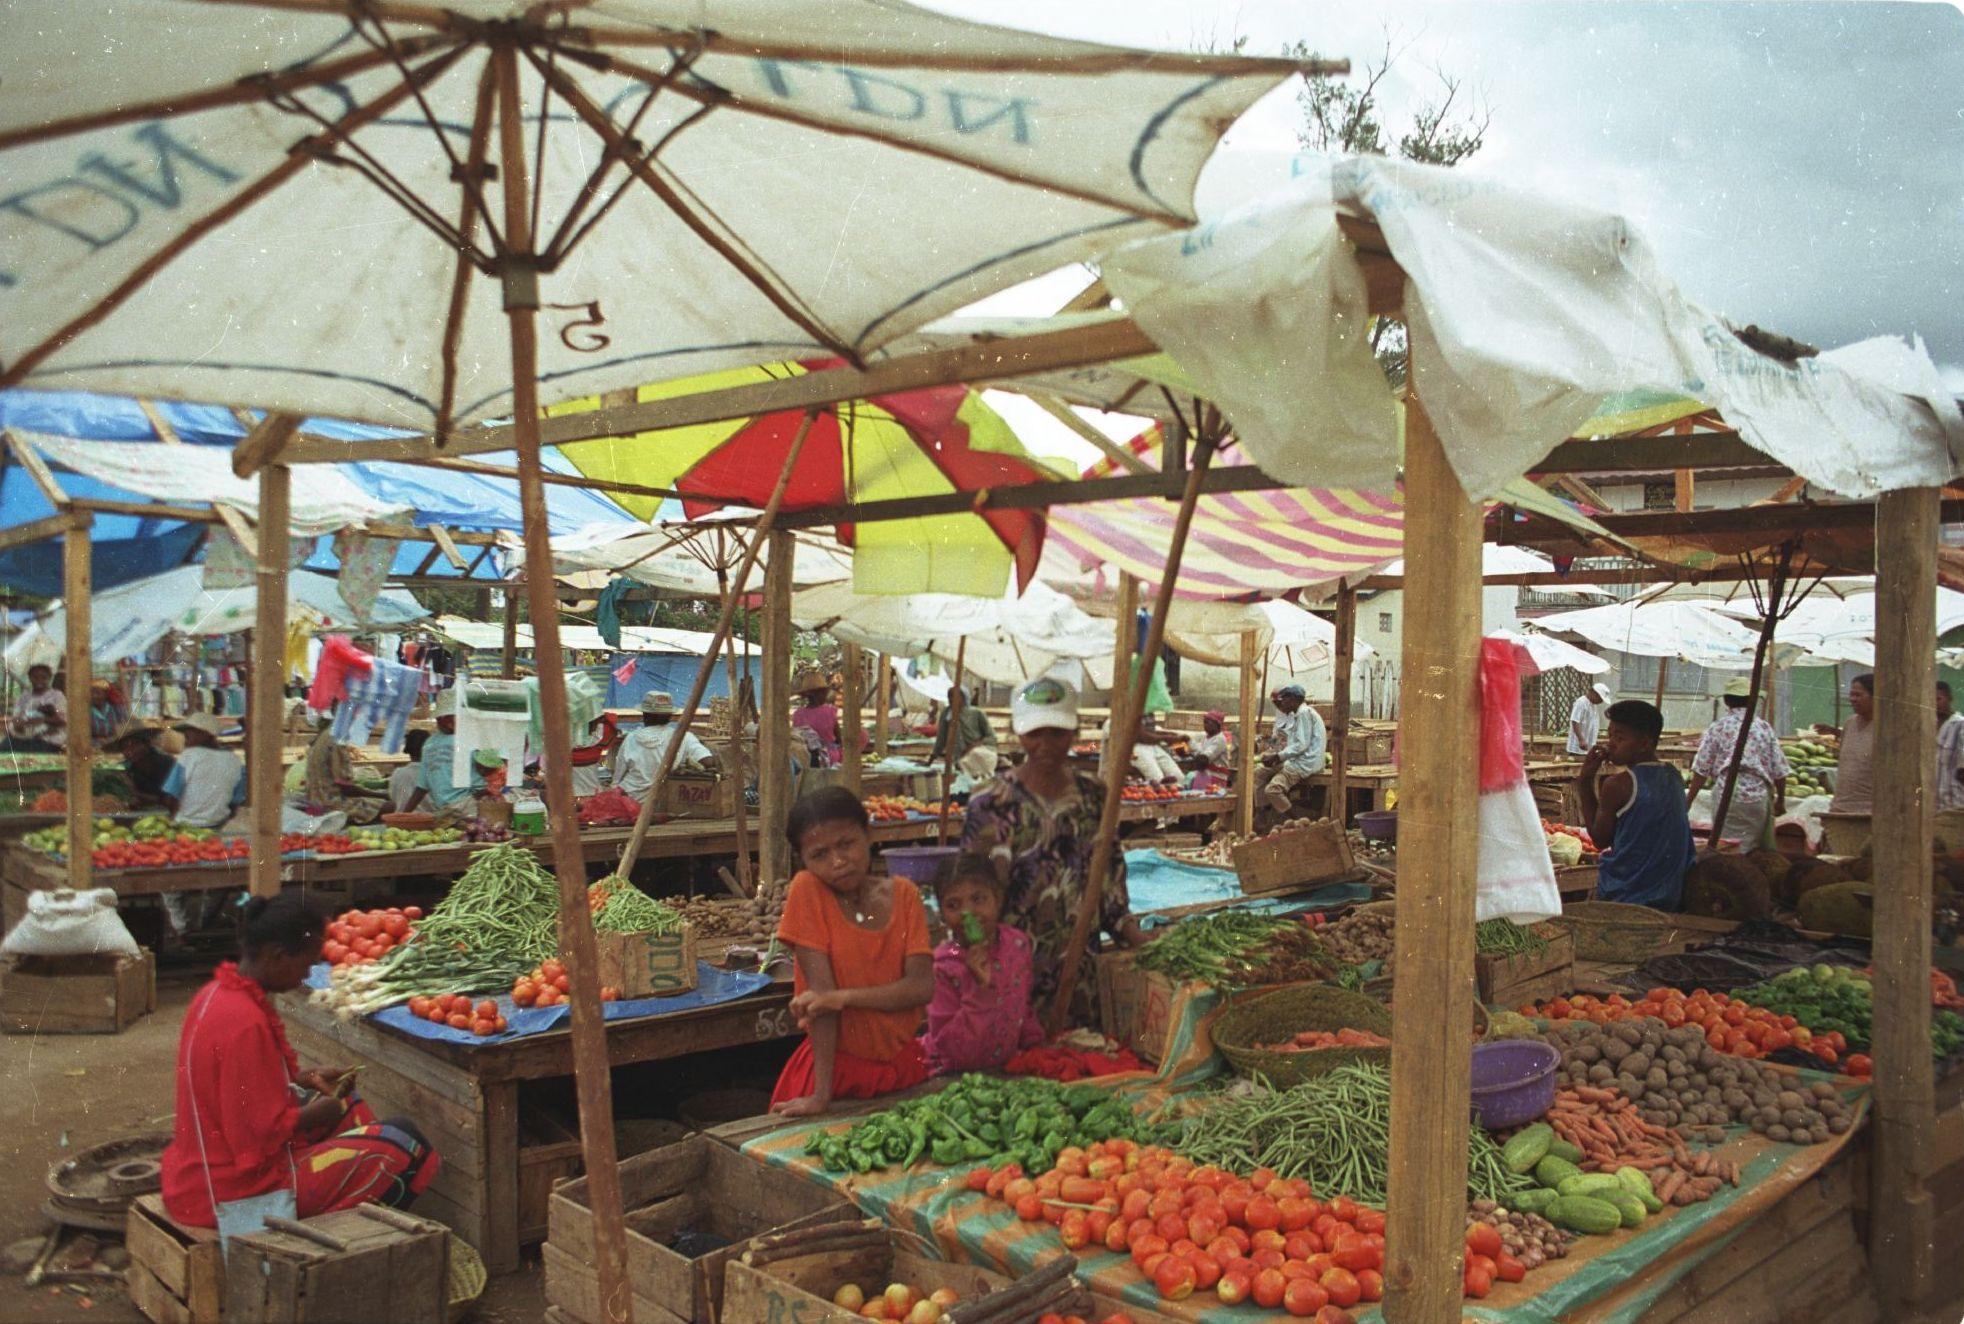 market place Marketplace foods - bemidji: (218) 444-1400 store hours: sunday - saturday 6:00am - 10:00pm.